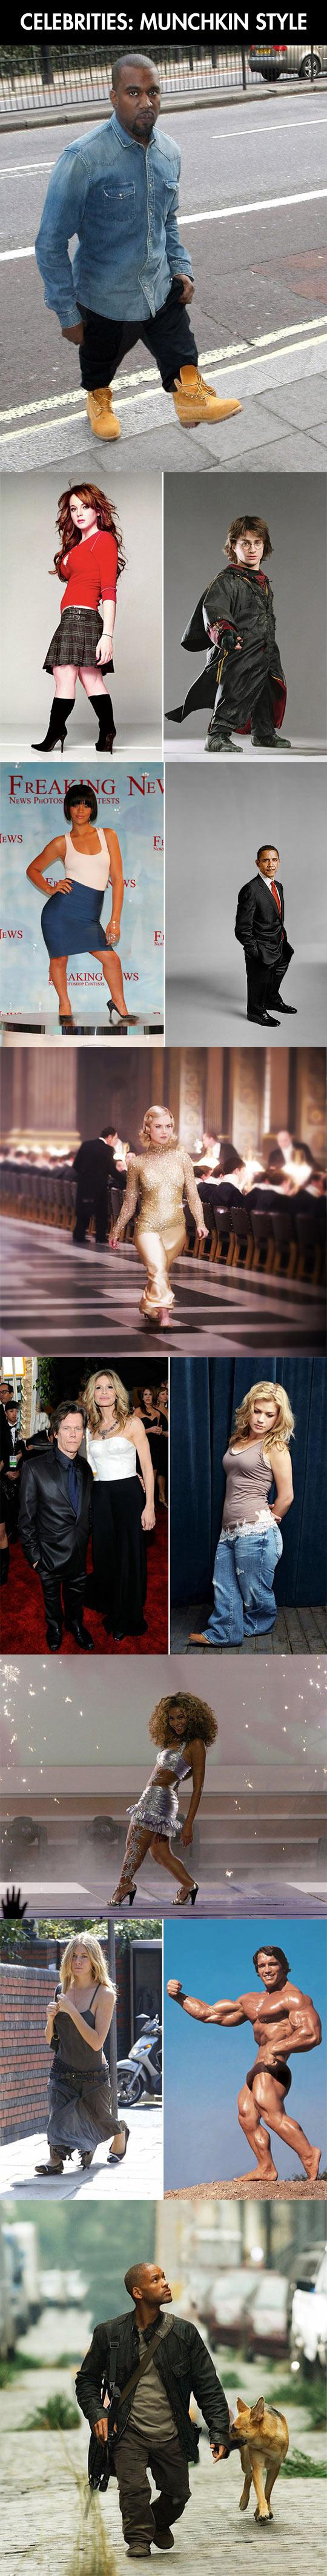 If celebrities were shorter…